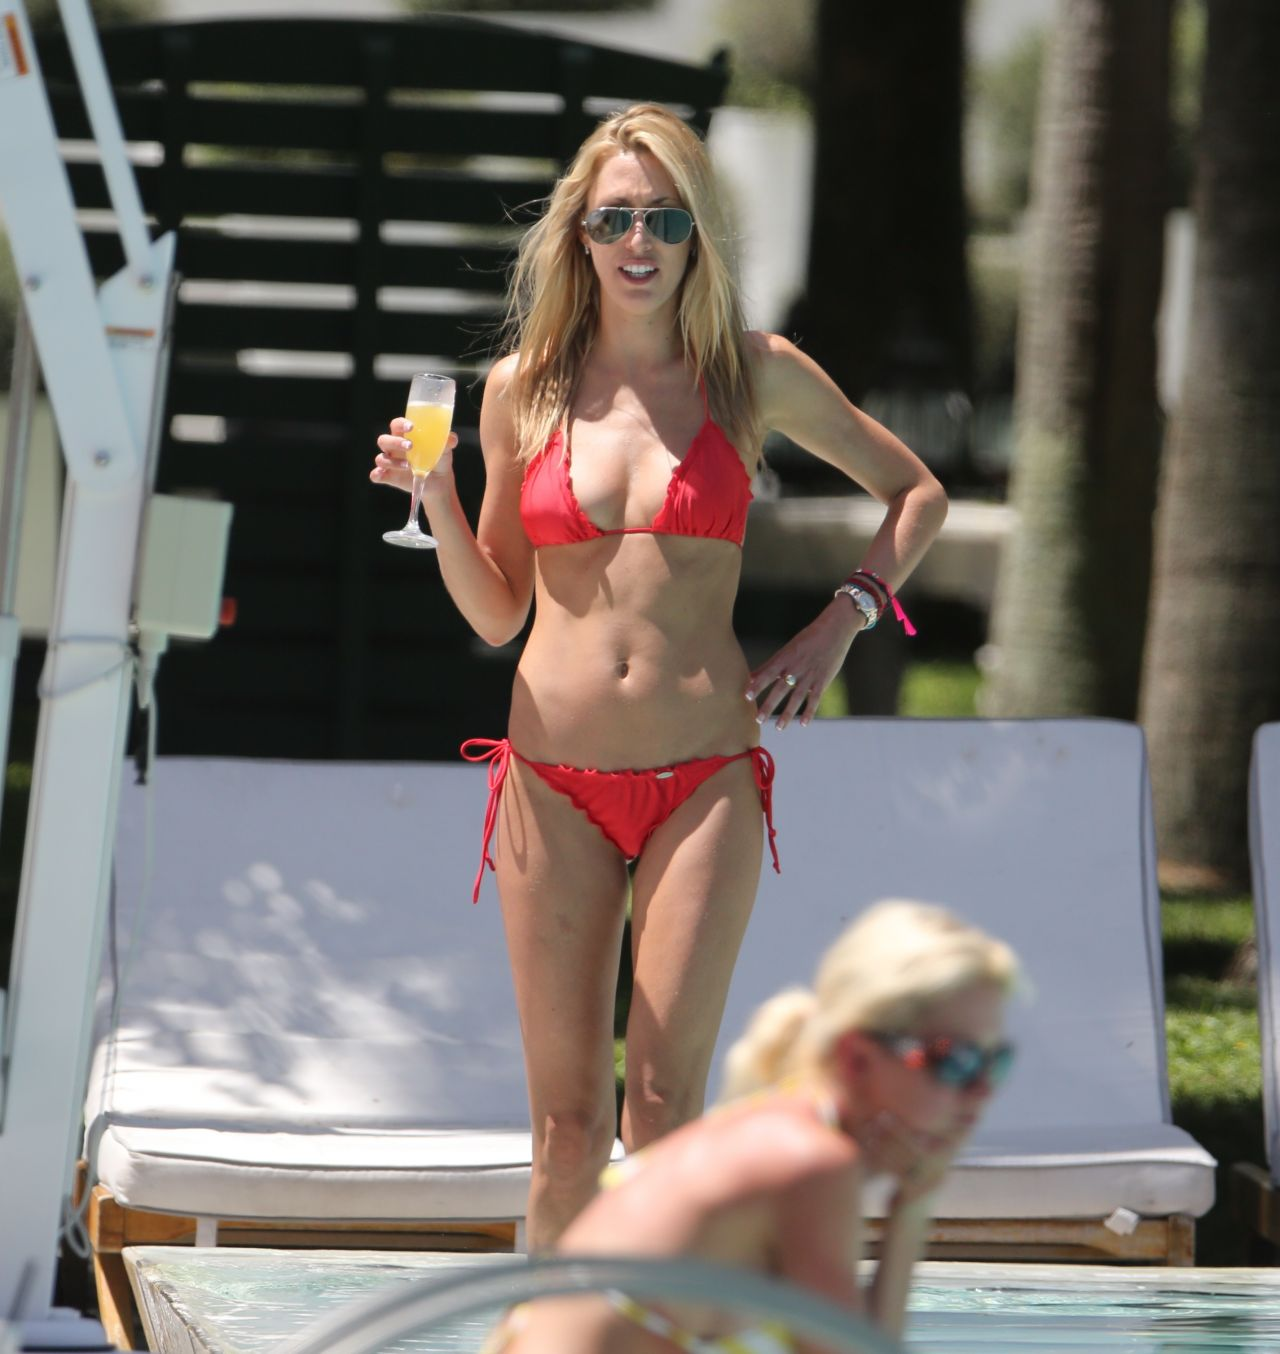 Lauren Stoner in Red Bikini - Enjoying the Miami Sun - April 2014